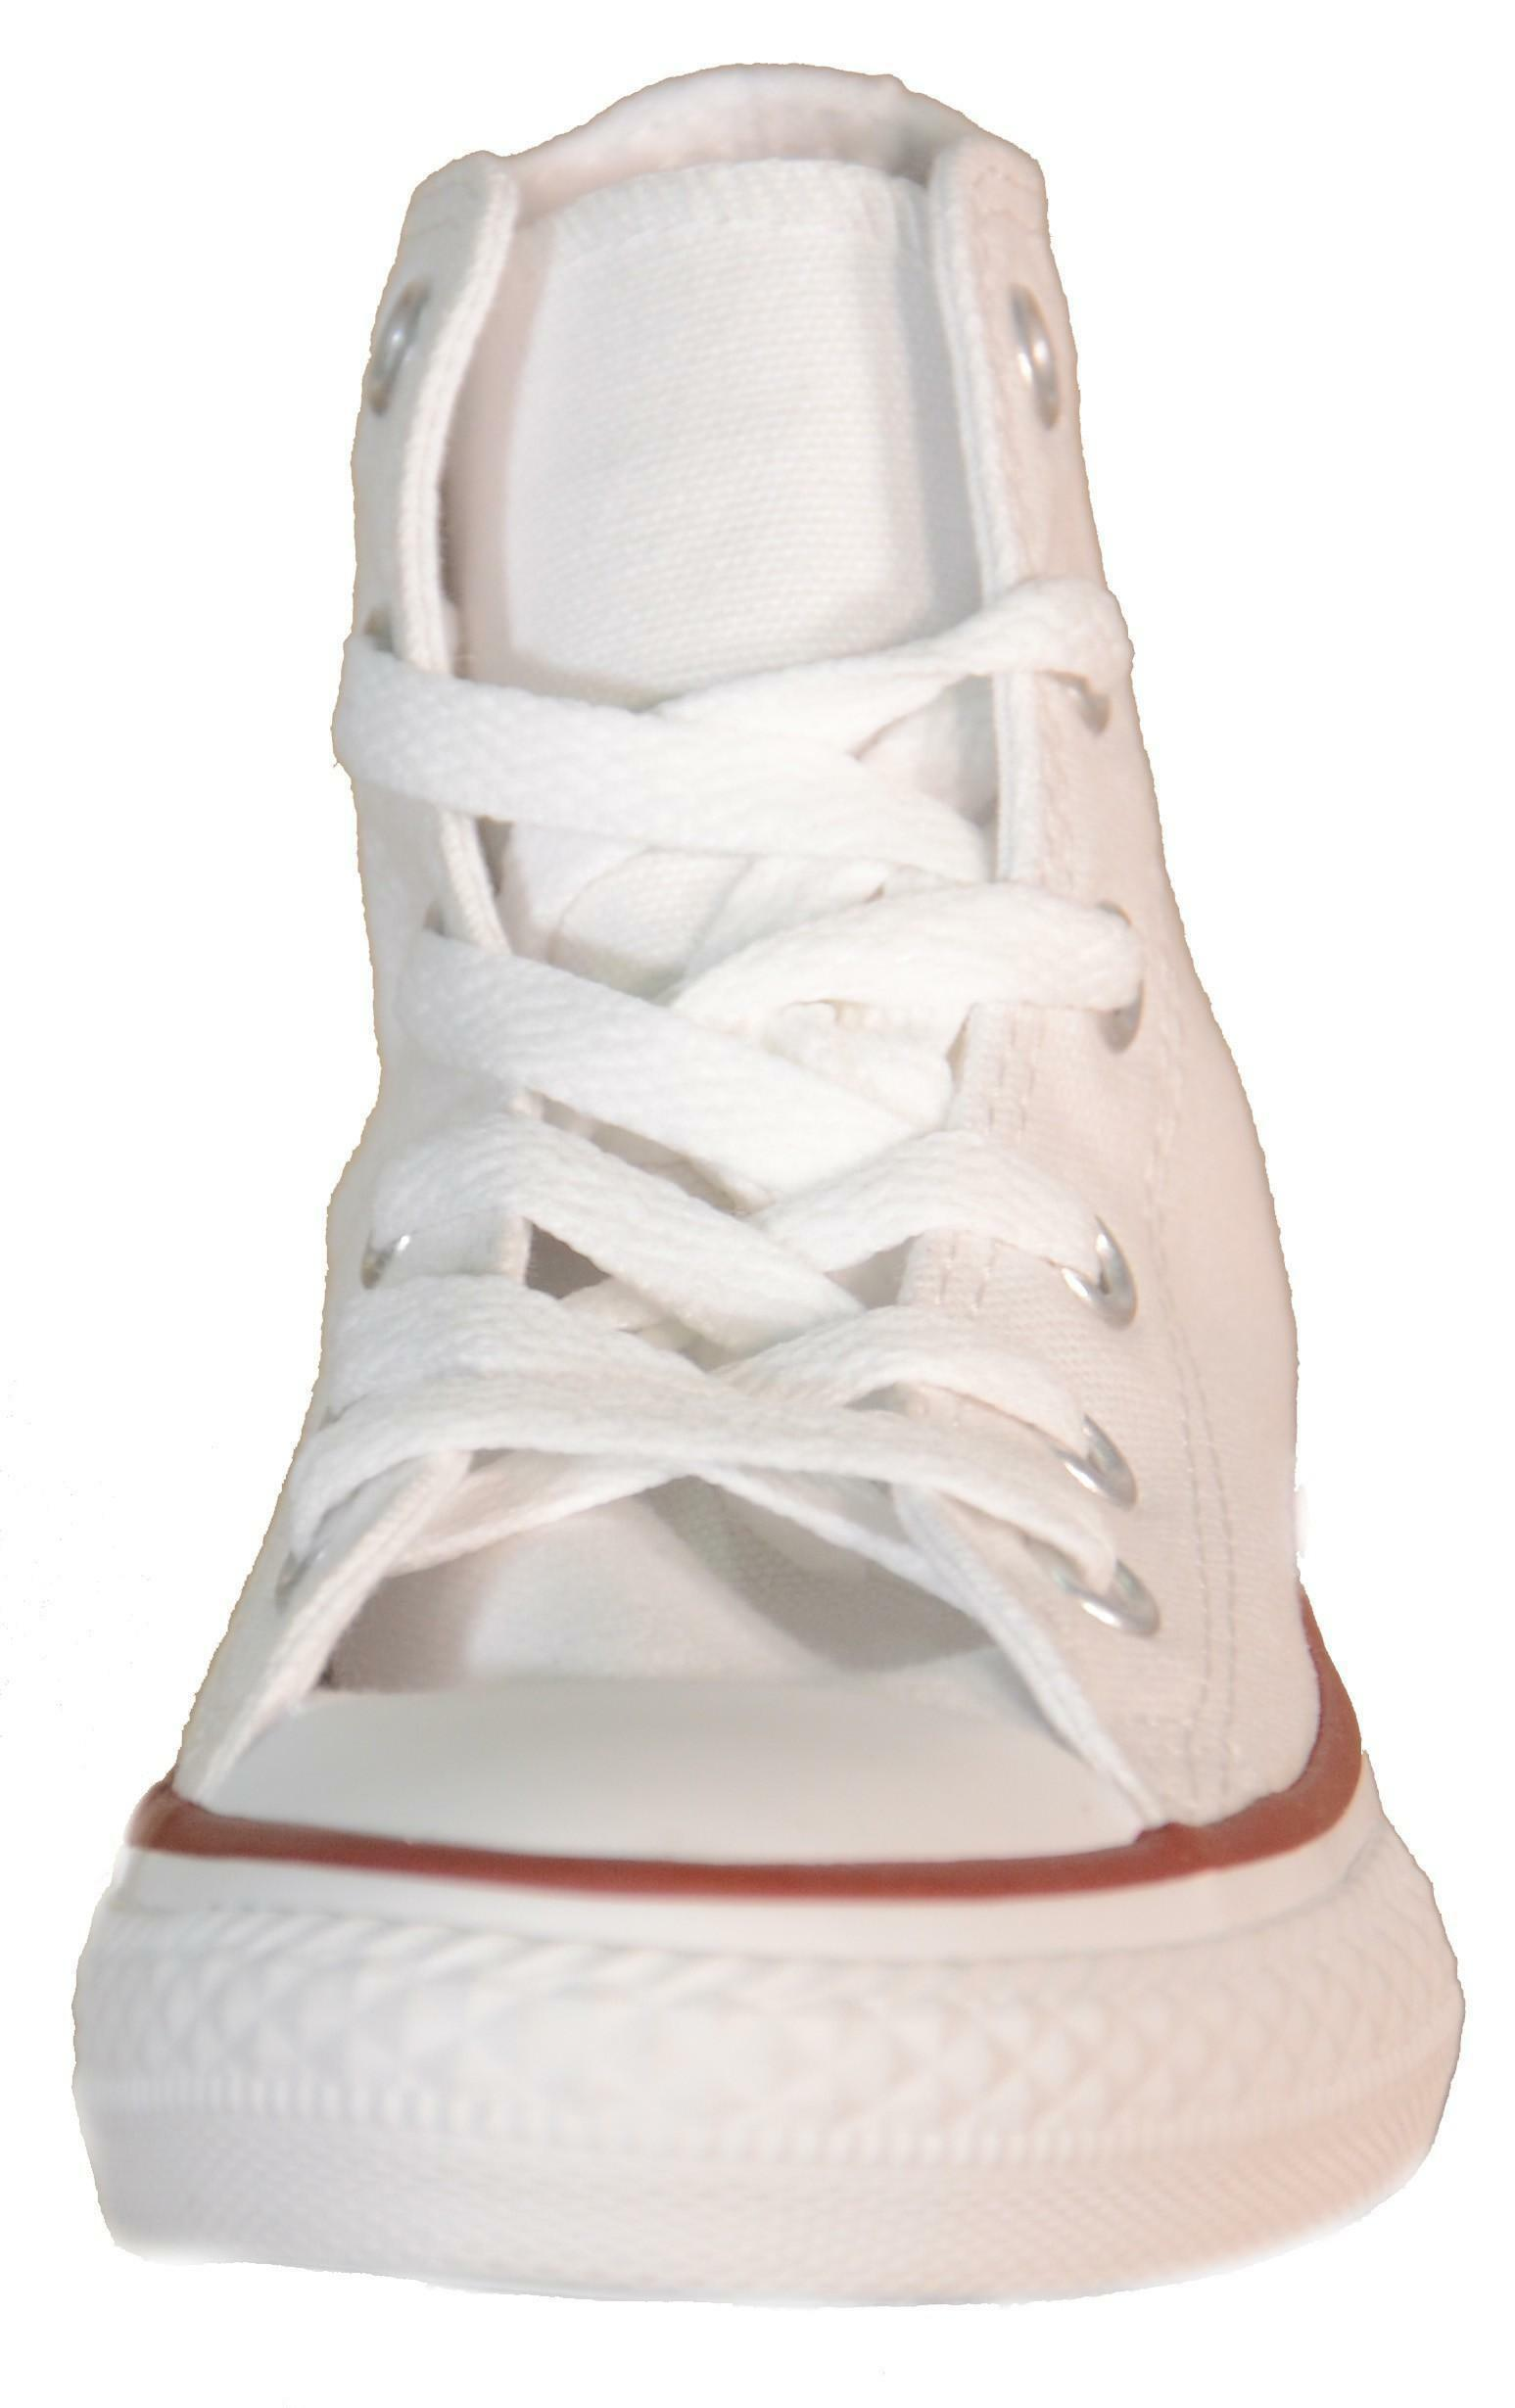 converse converse all star ct scarpe alte hi bianche white junior 3j253